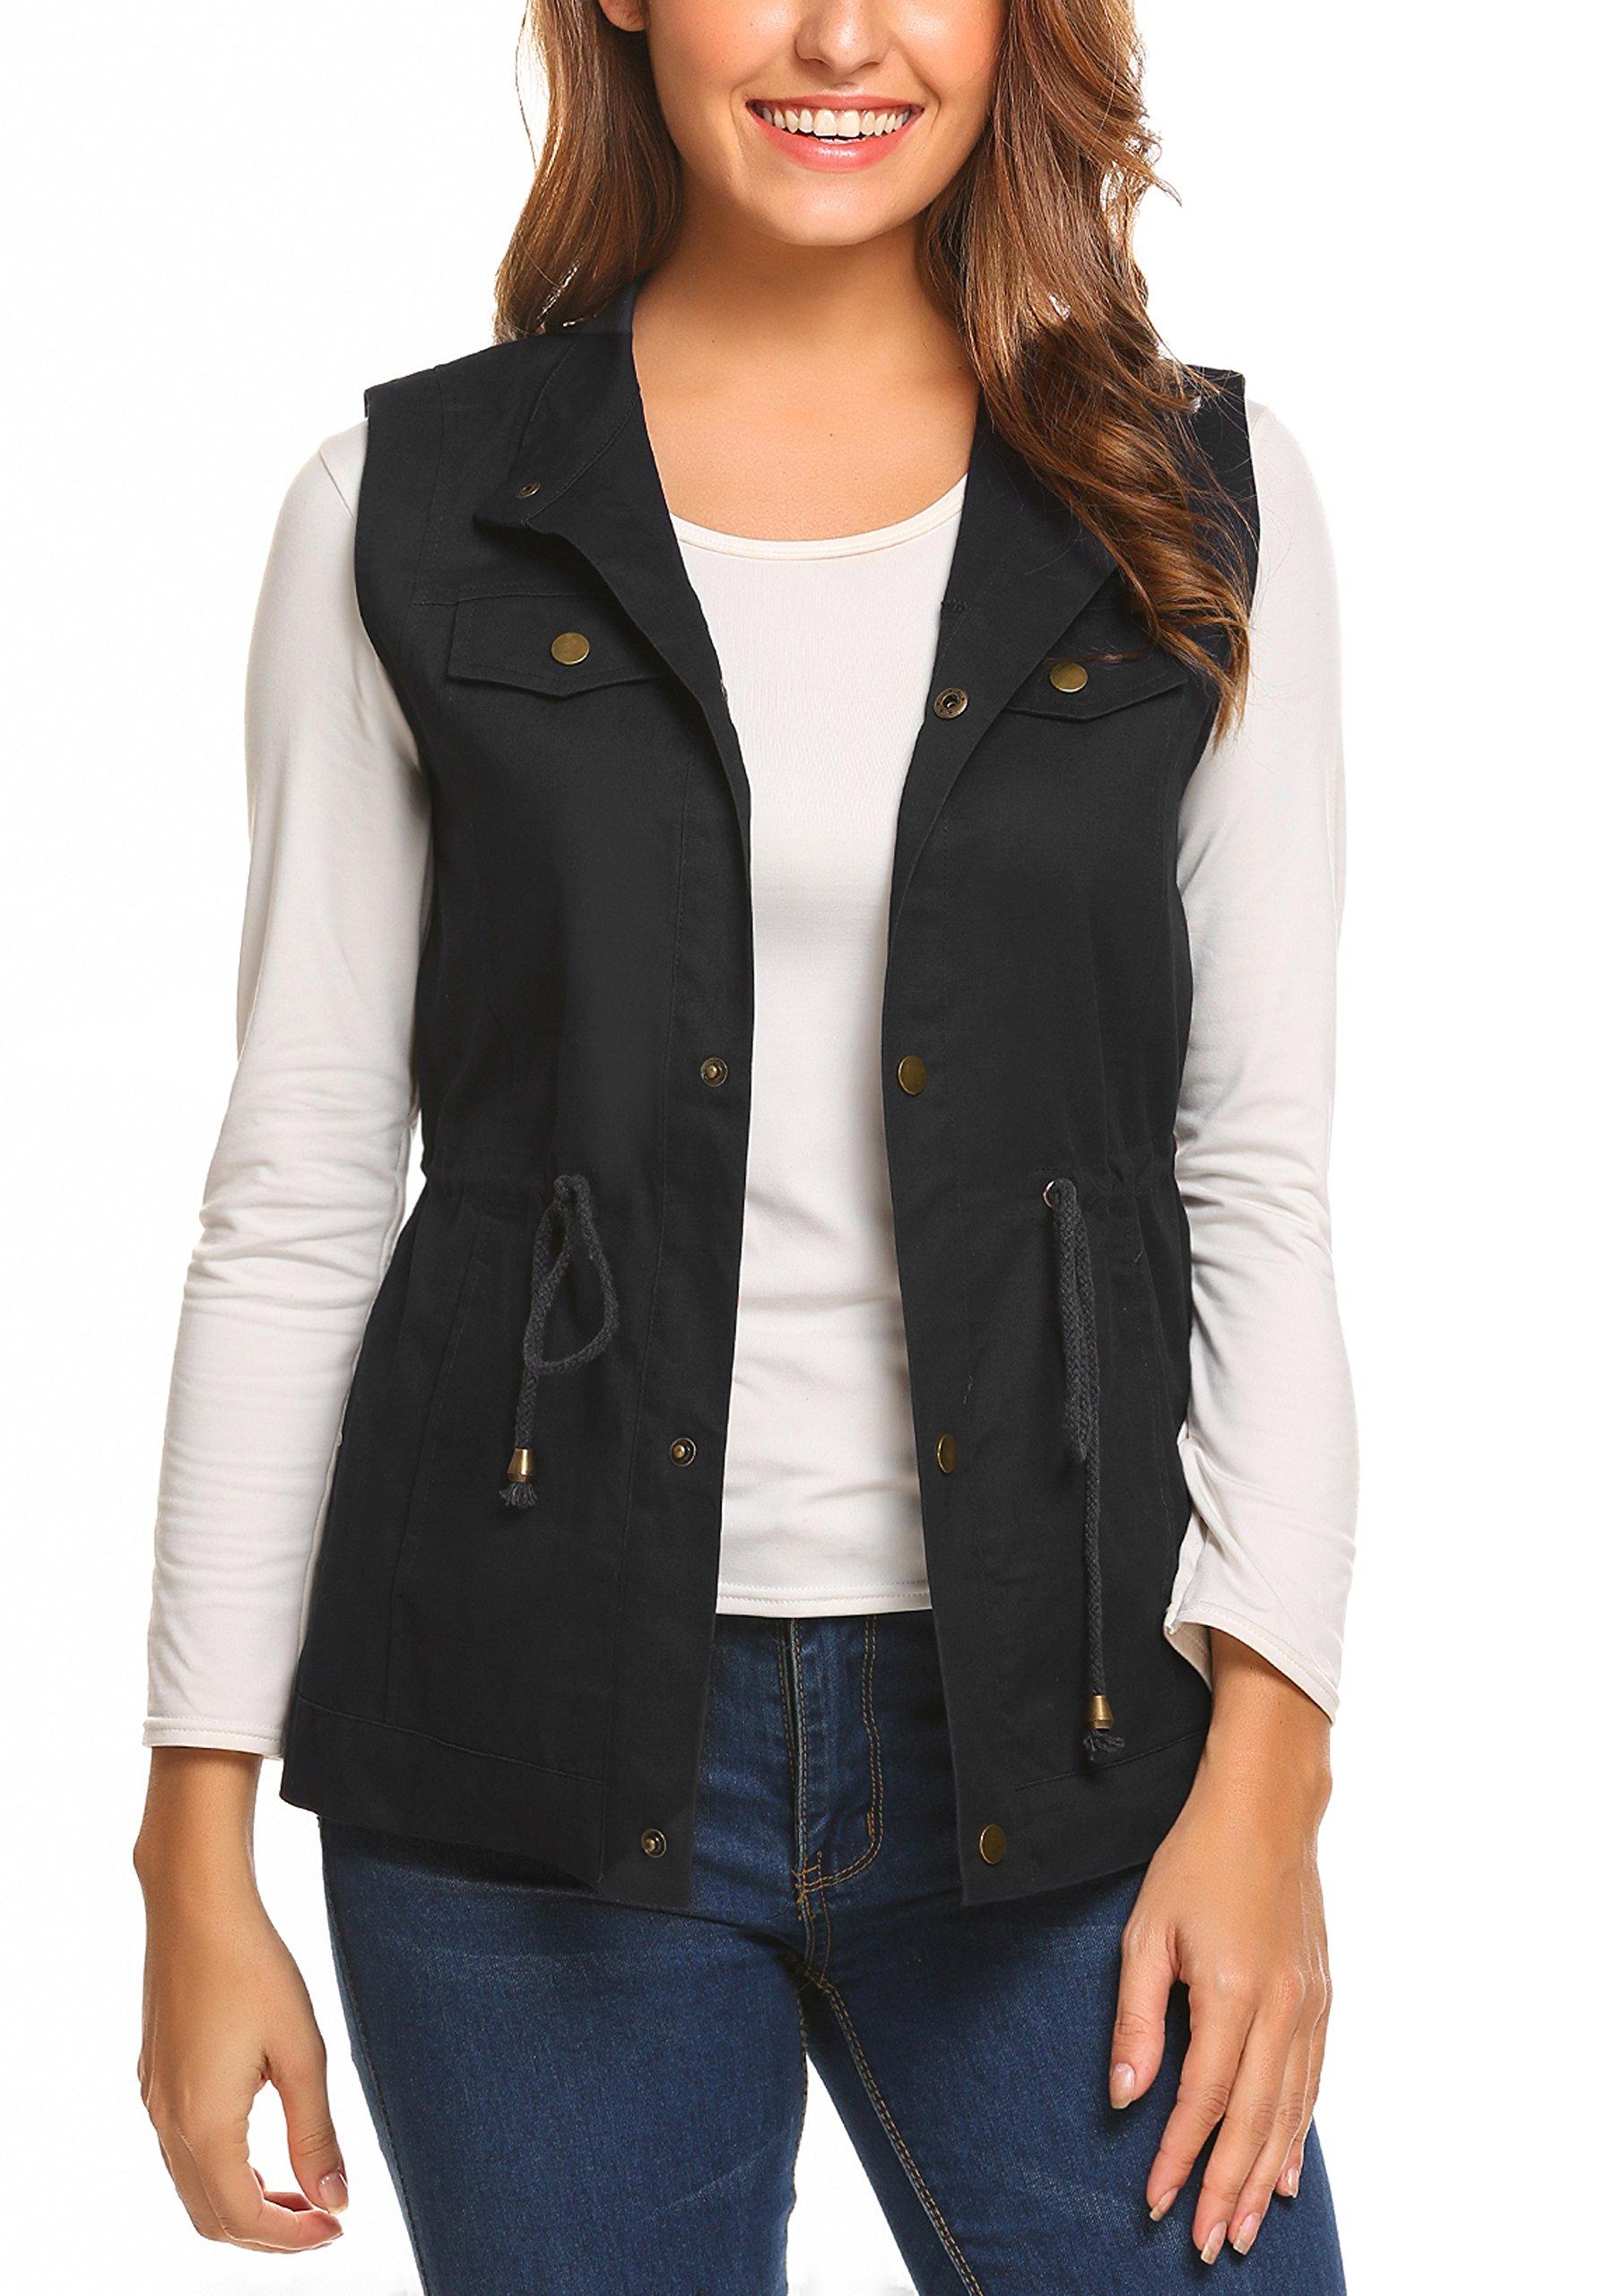 Beyove Womens Lightweight Sleeveless Short Anorak Style Vest, Black, XL